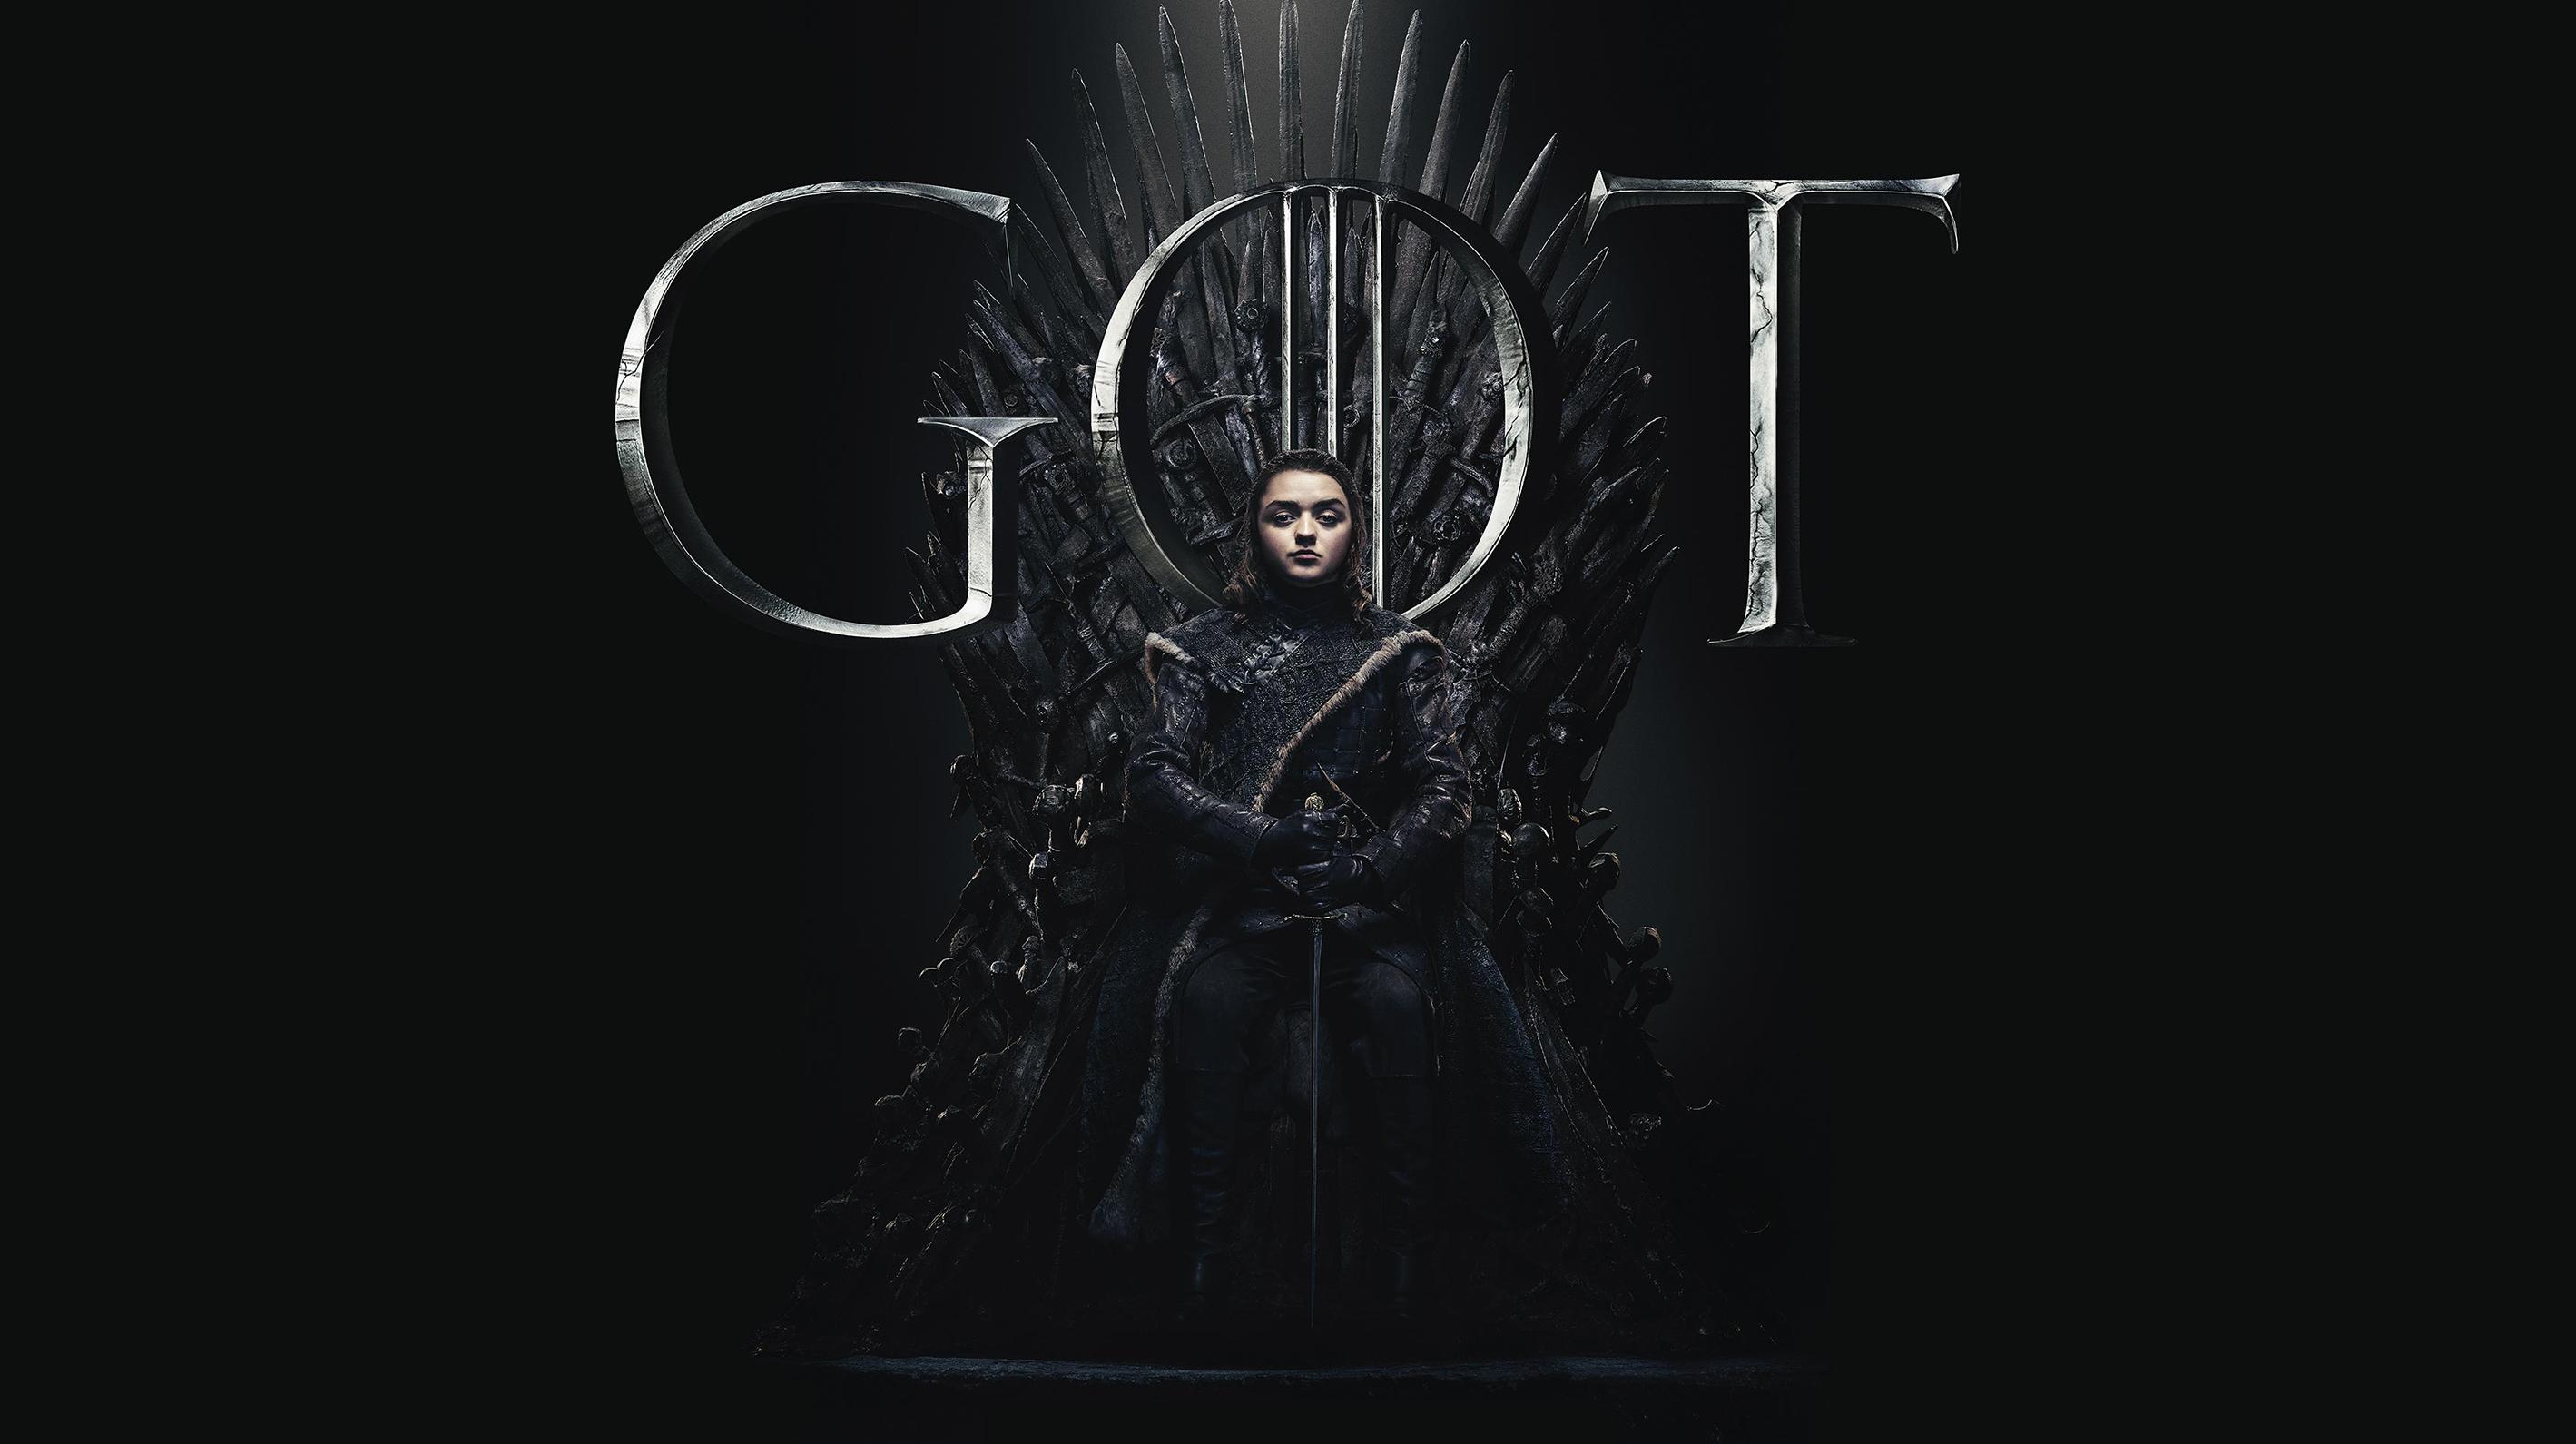 Arya Stark Game Of Thrones Season 8 Poster Wallpaper, HD ...